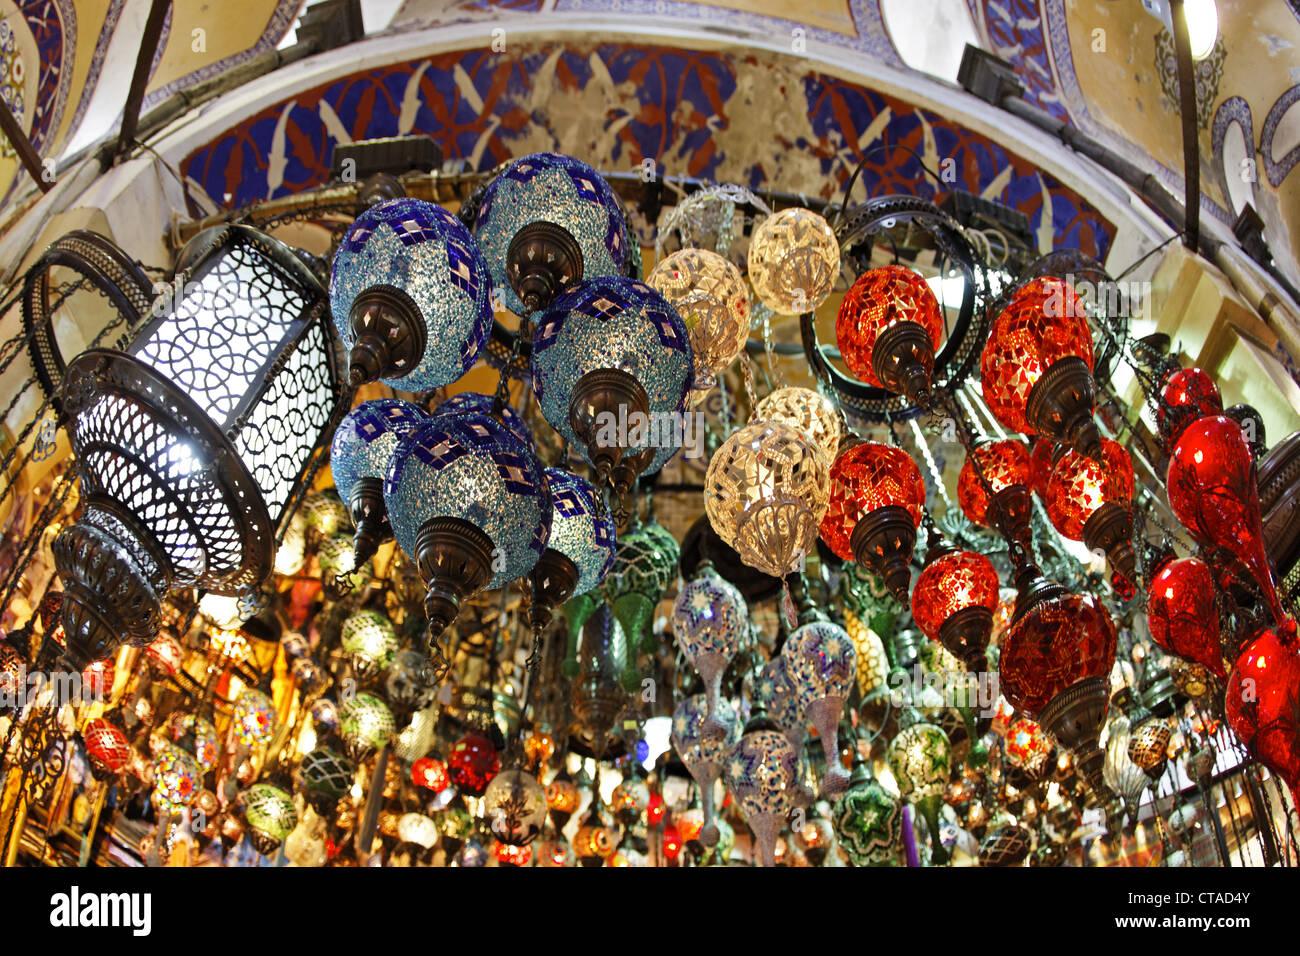 Lampes à Grand Bazar turc marché, Istanbul, Turquie, Europe Photo Stock